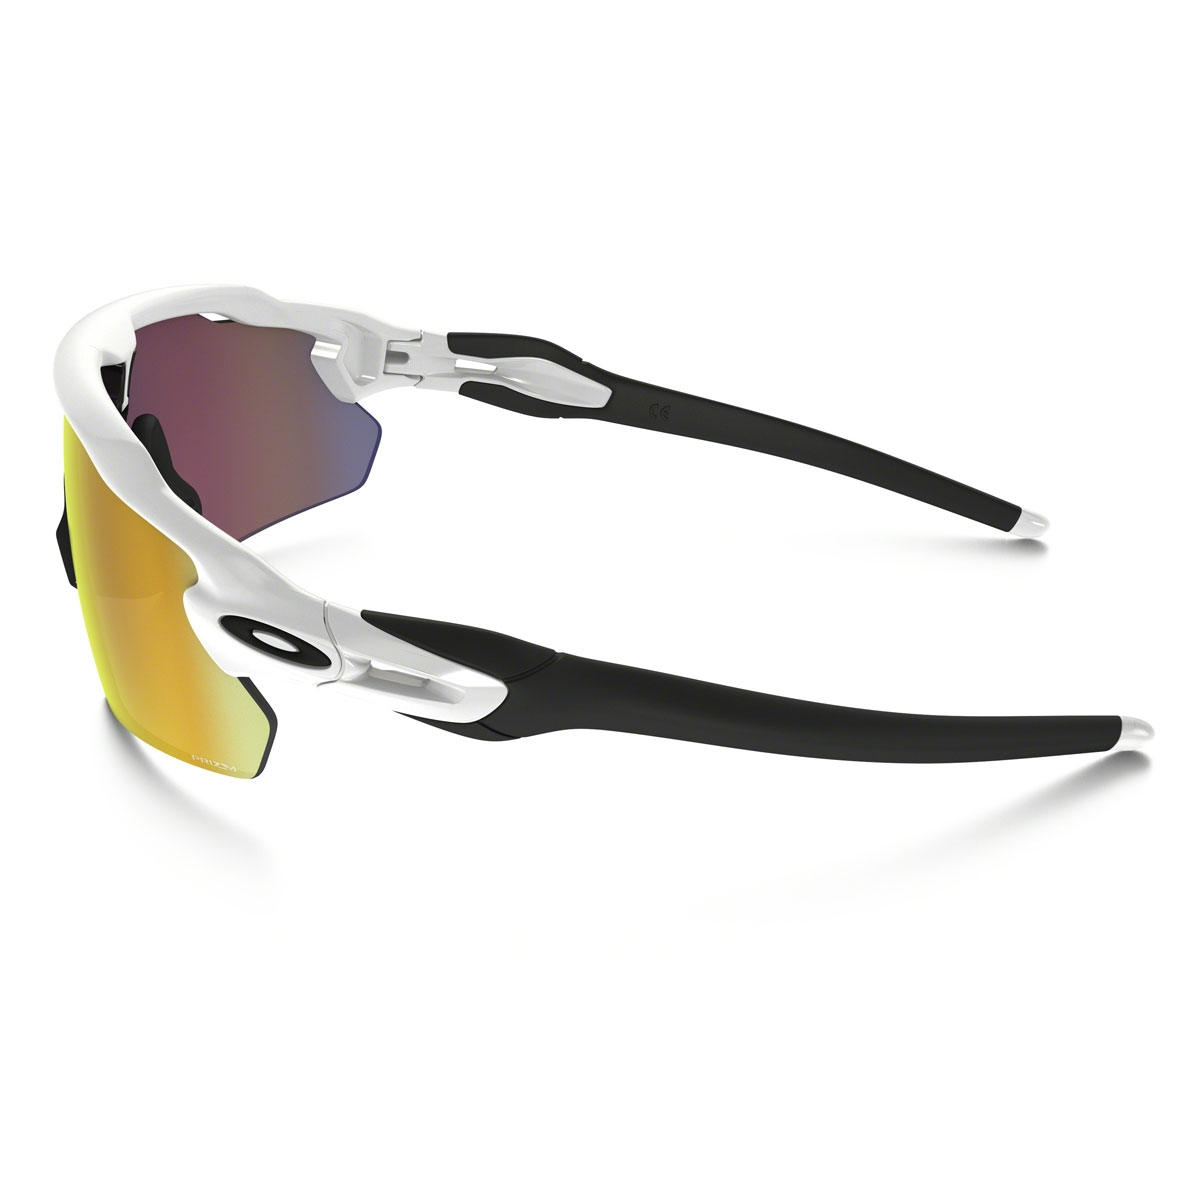 43a52c8847 ... Image of Oakley Radar EV Pitch Men s Prizm Cricket Sunglasses -  Polished White Frame Prizm ...